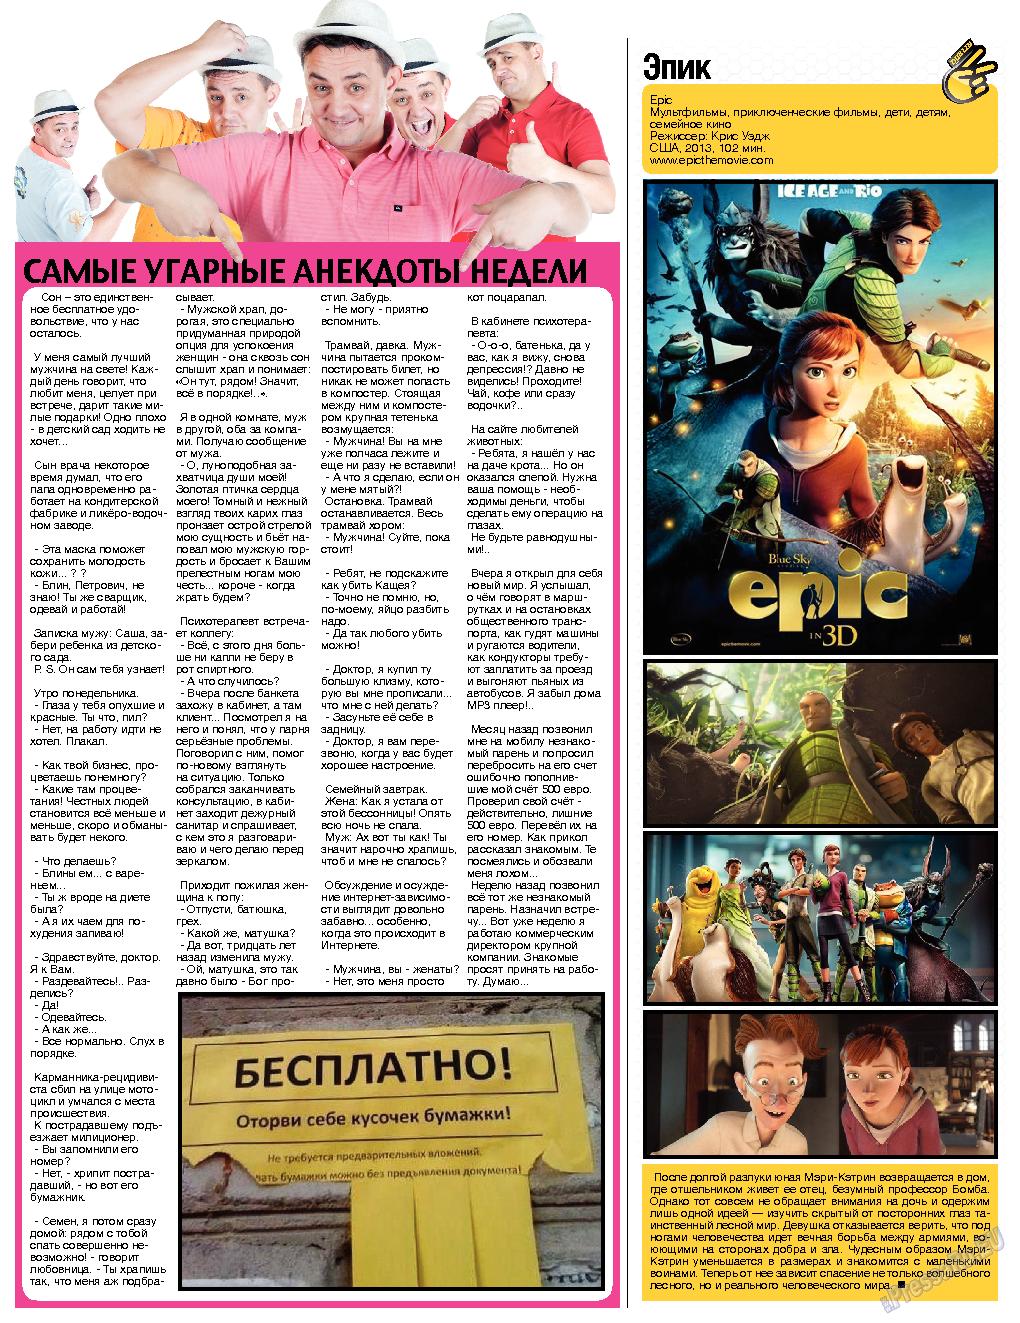 Дублин инфоцентр (газета). 2013 год, номер 21, стр. 7